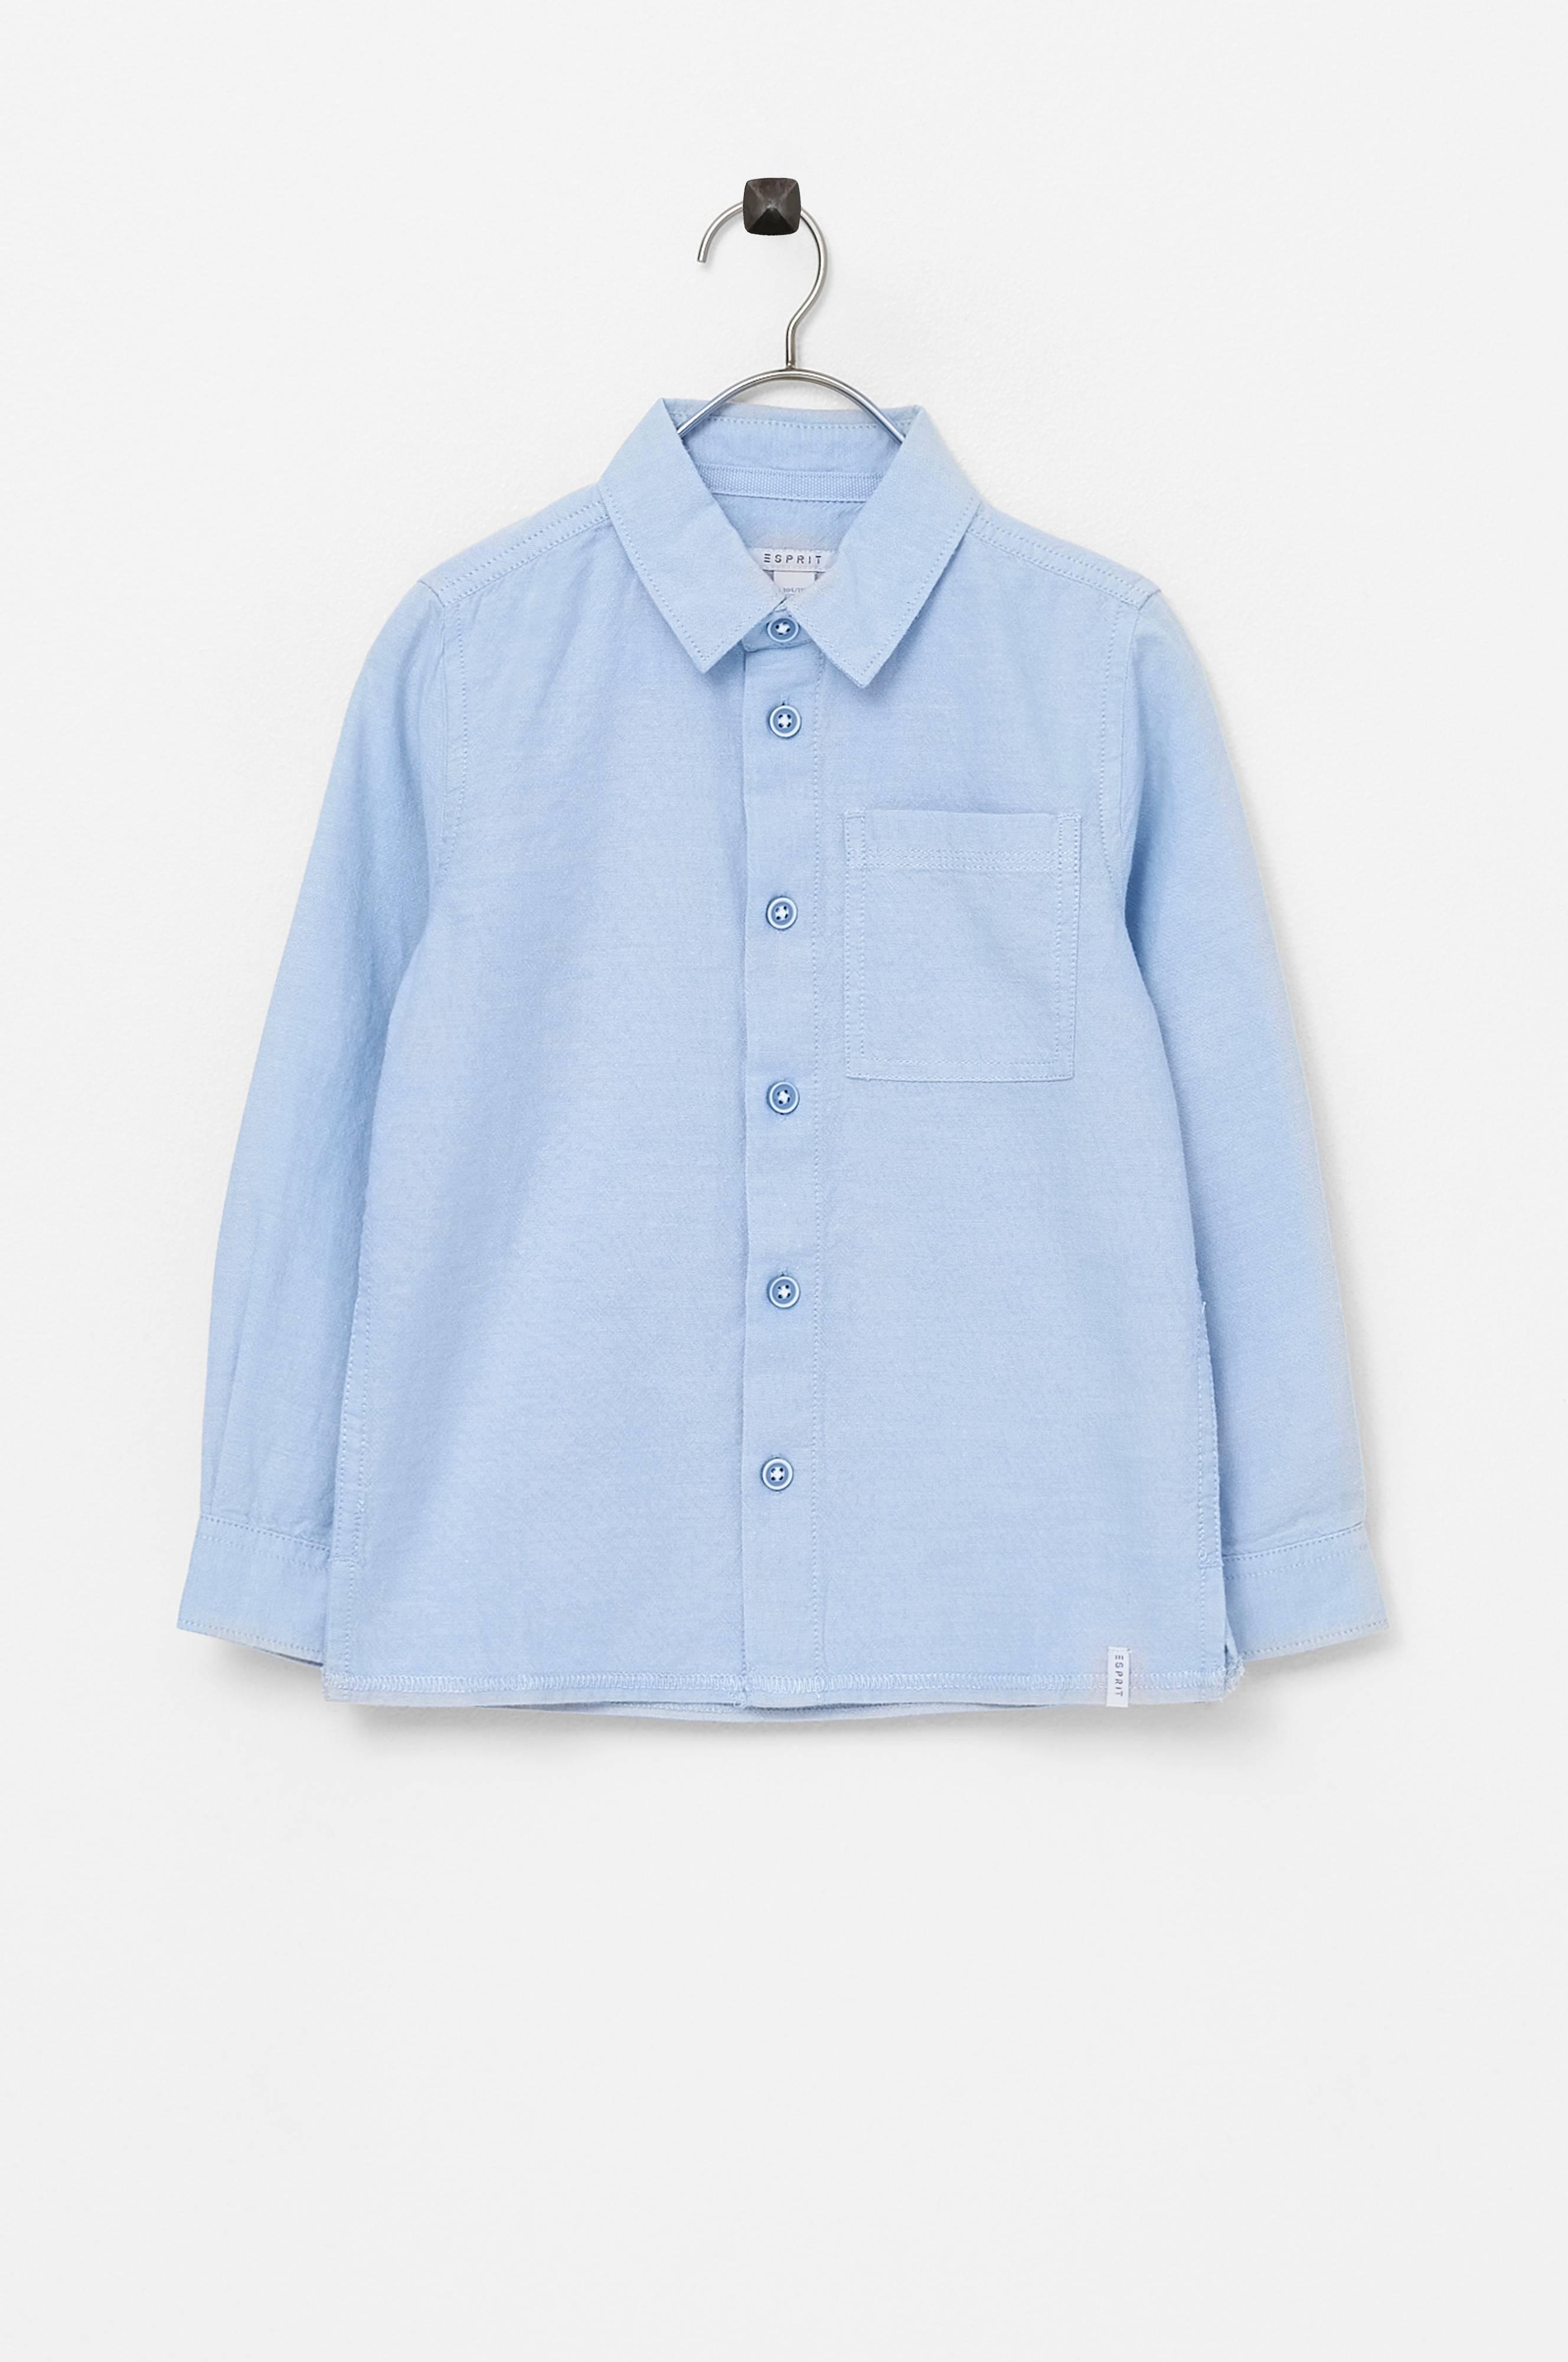 Esprit Skjorte Blå Skjorter Ellos.no